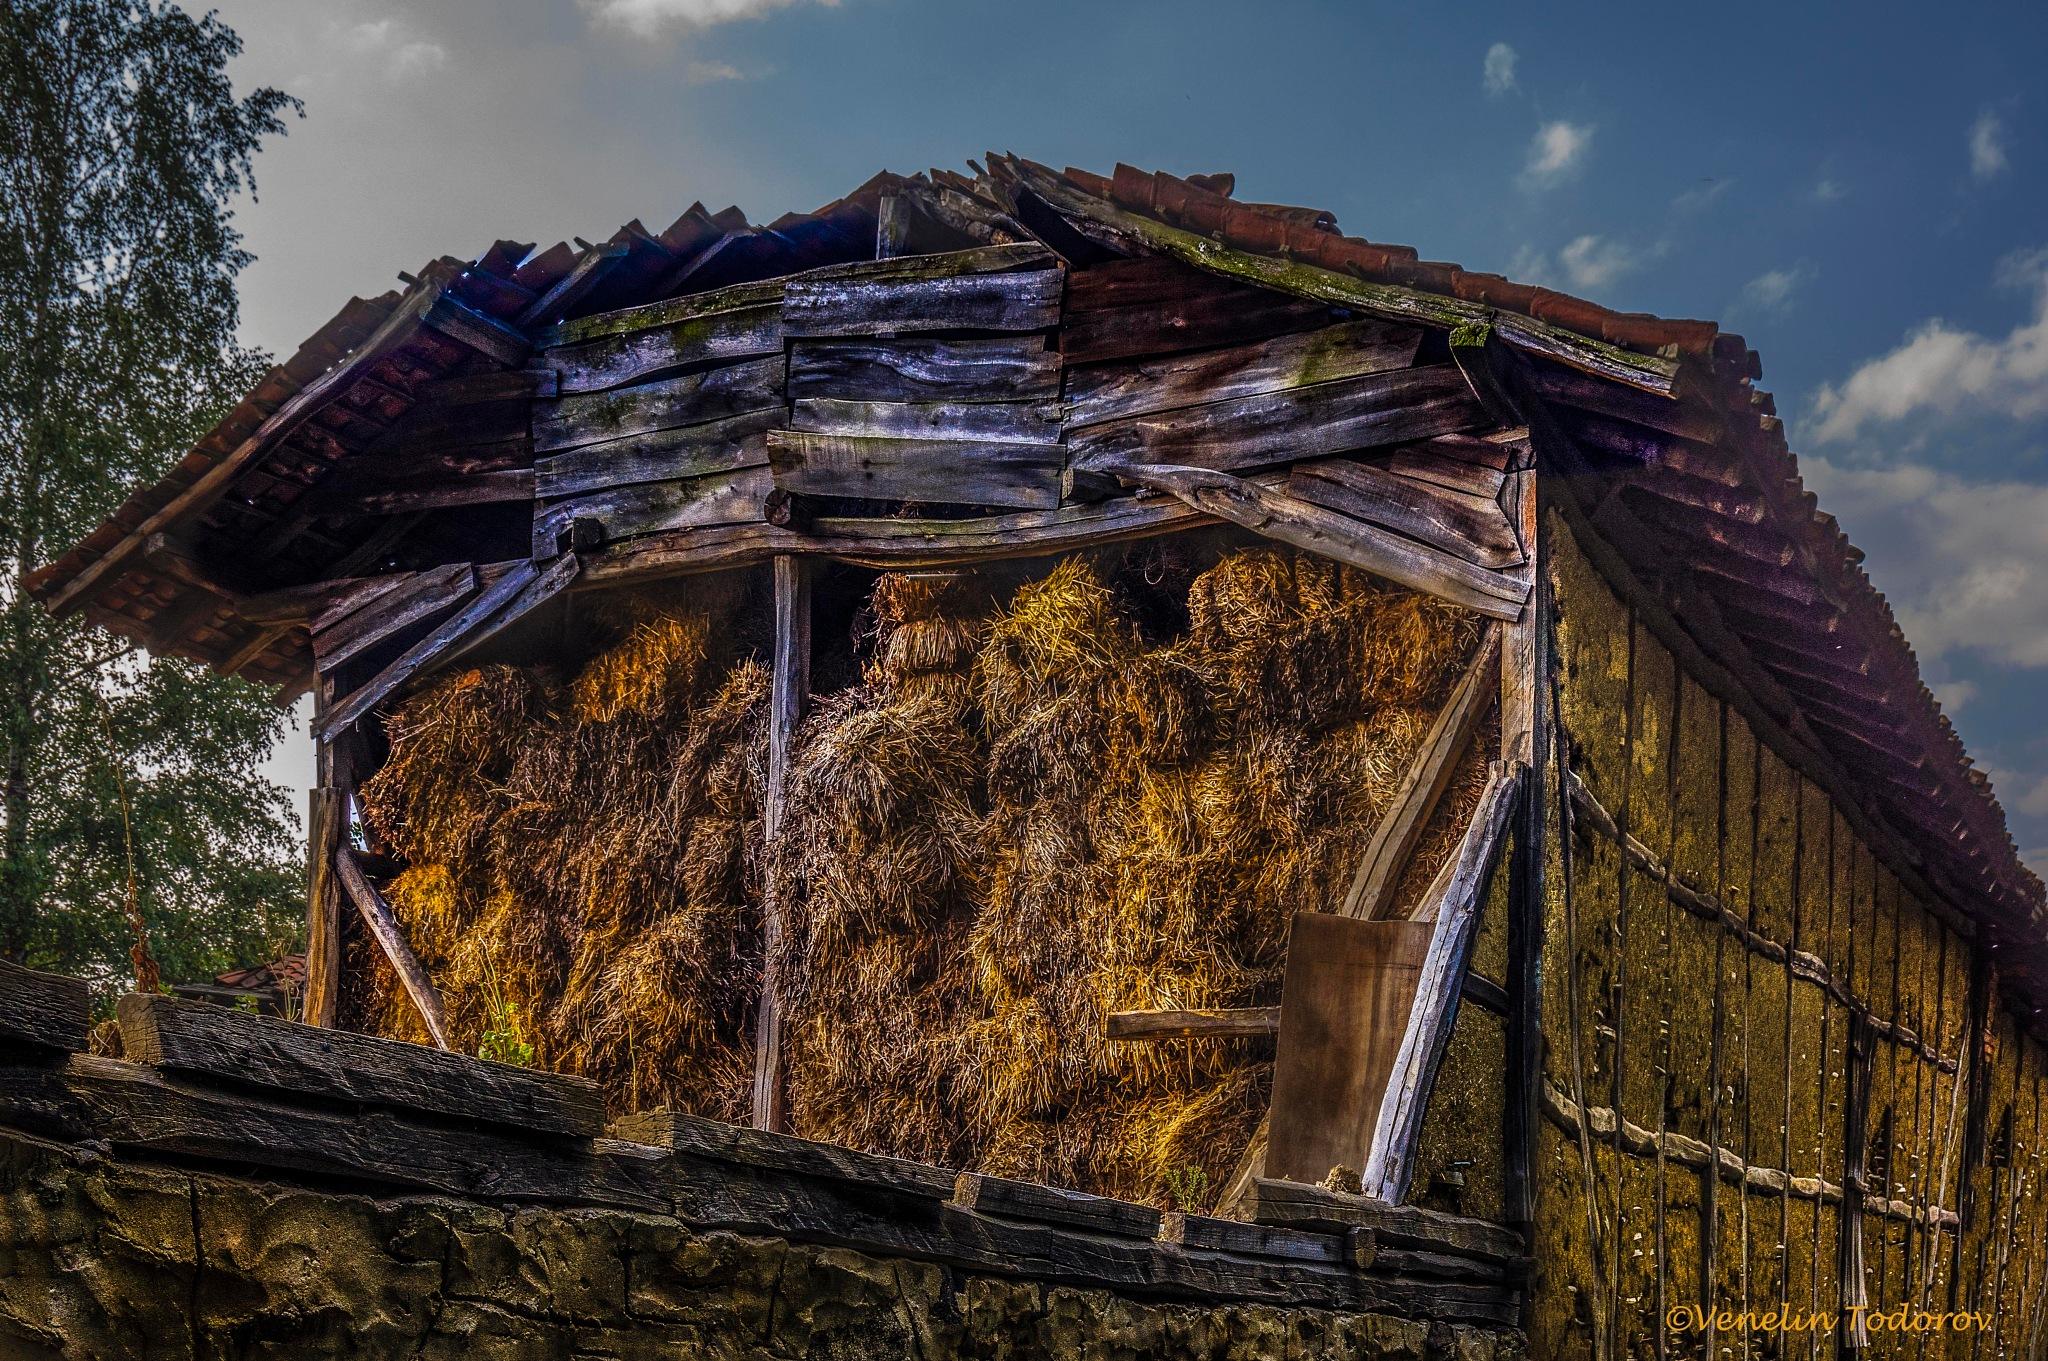 The old barn by Venelin Todorov